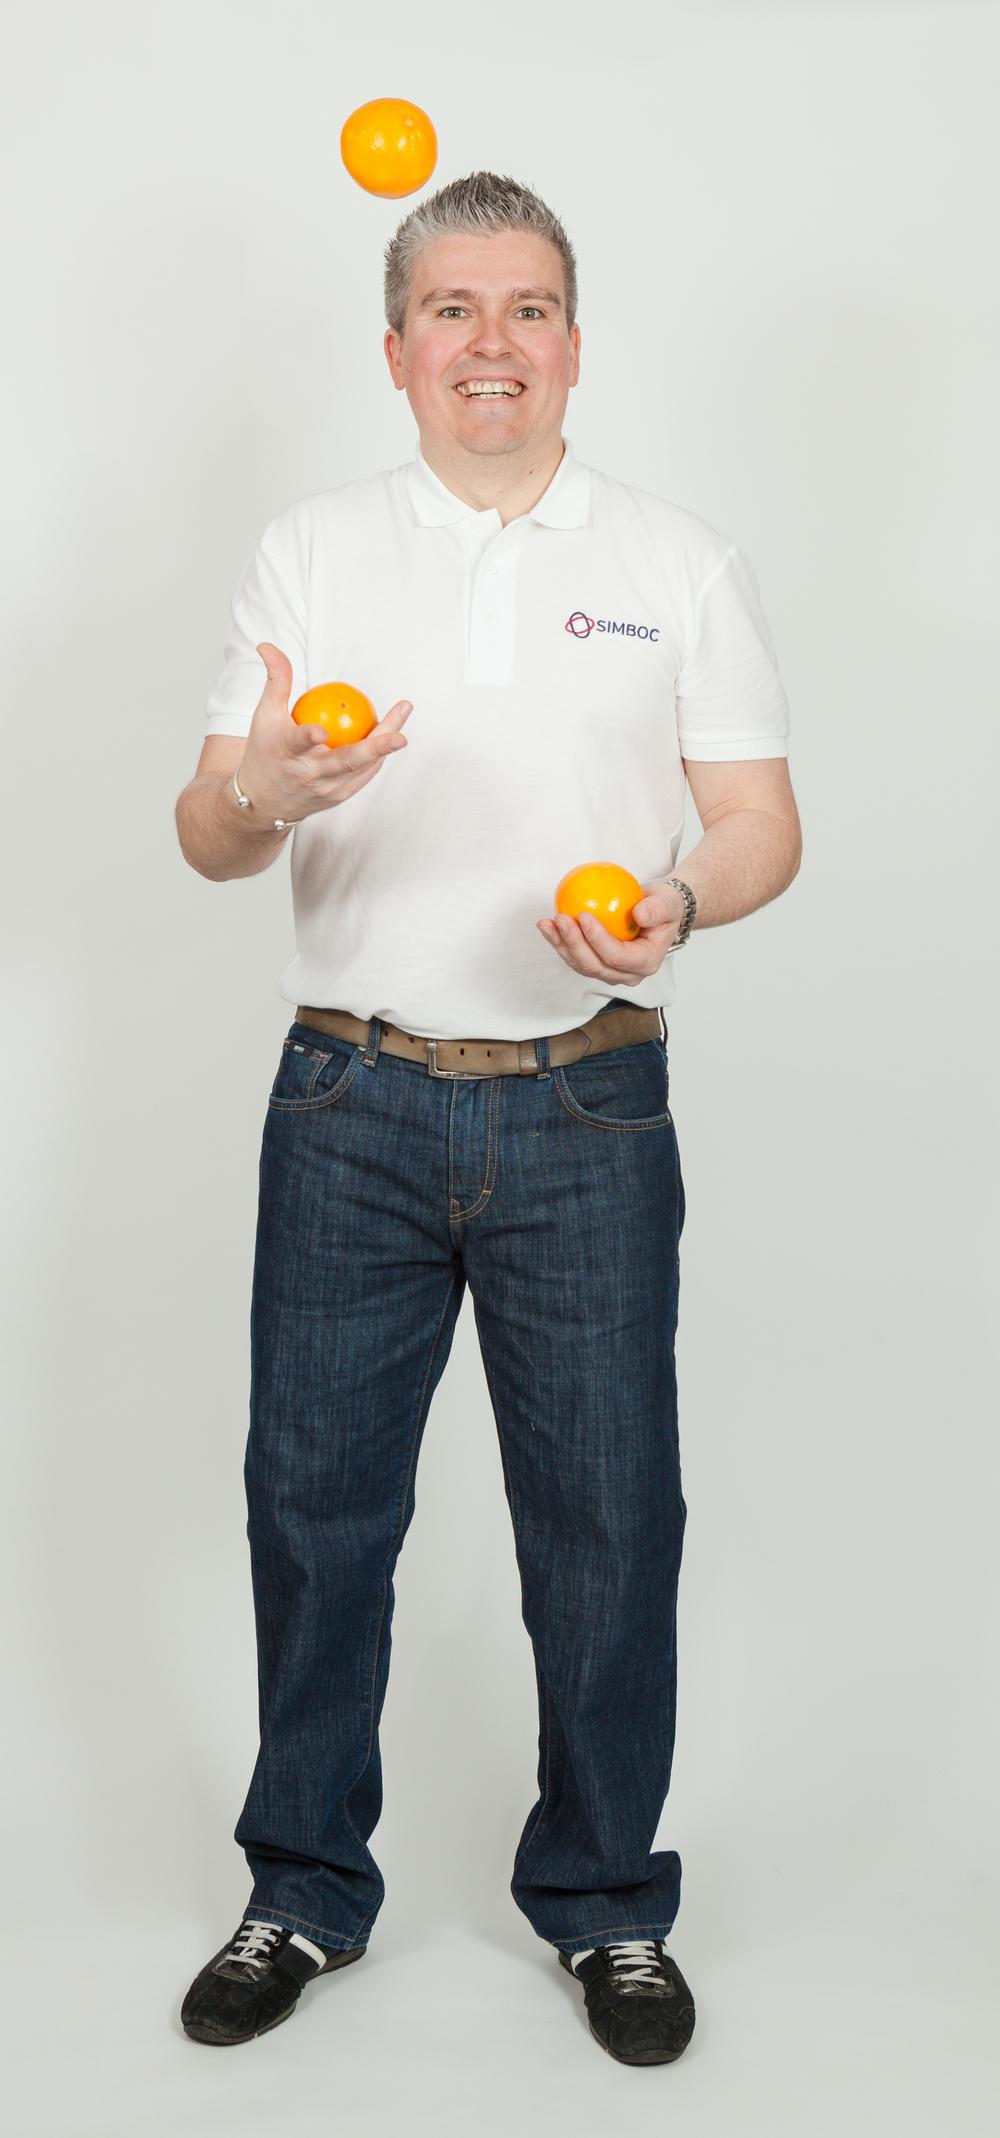 Dave juggling oranges serious face_SimbocLtd_6513.jpg